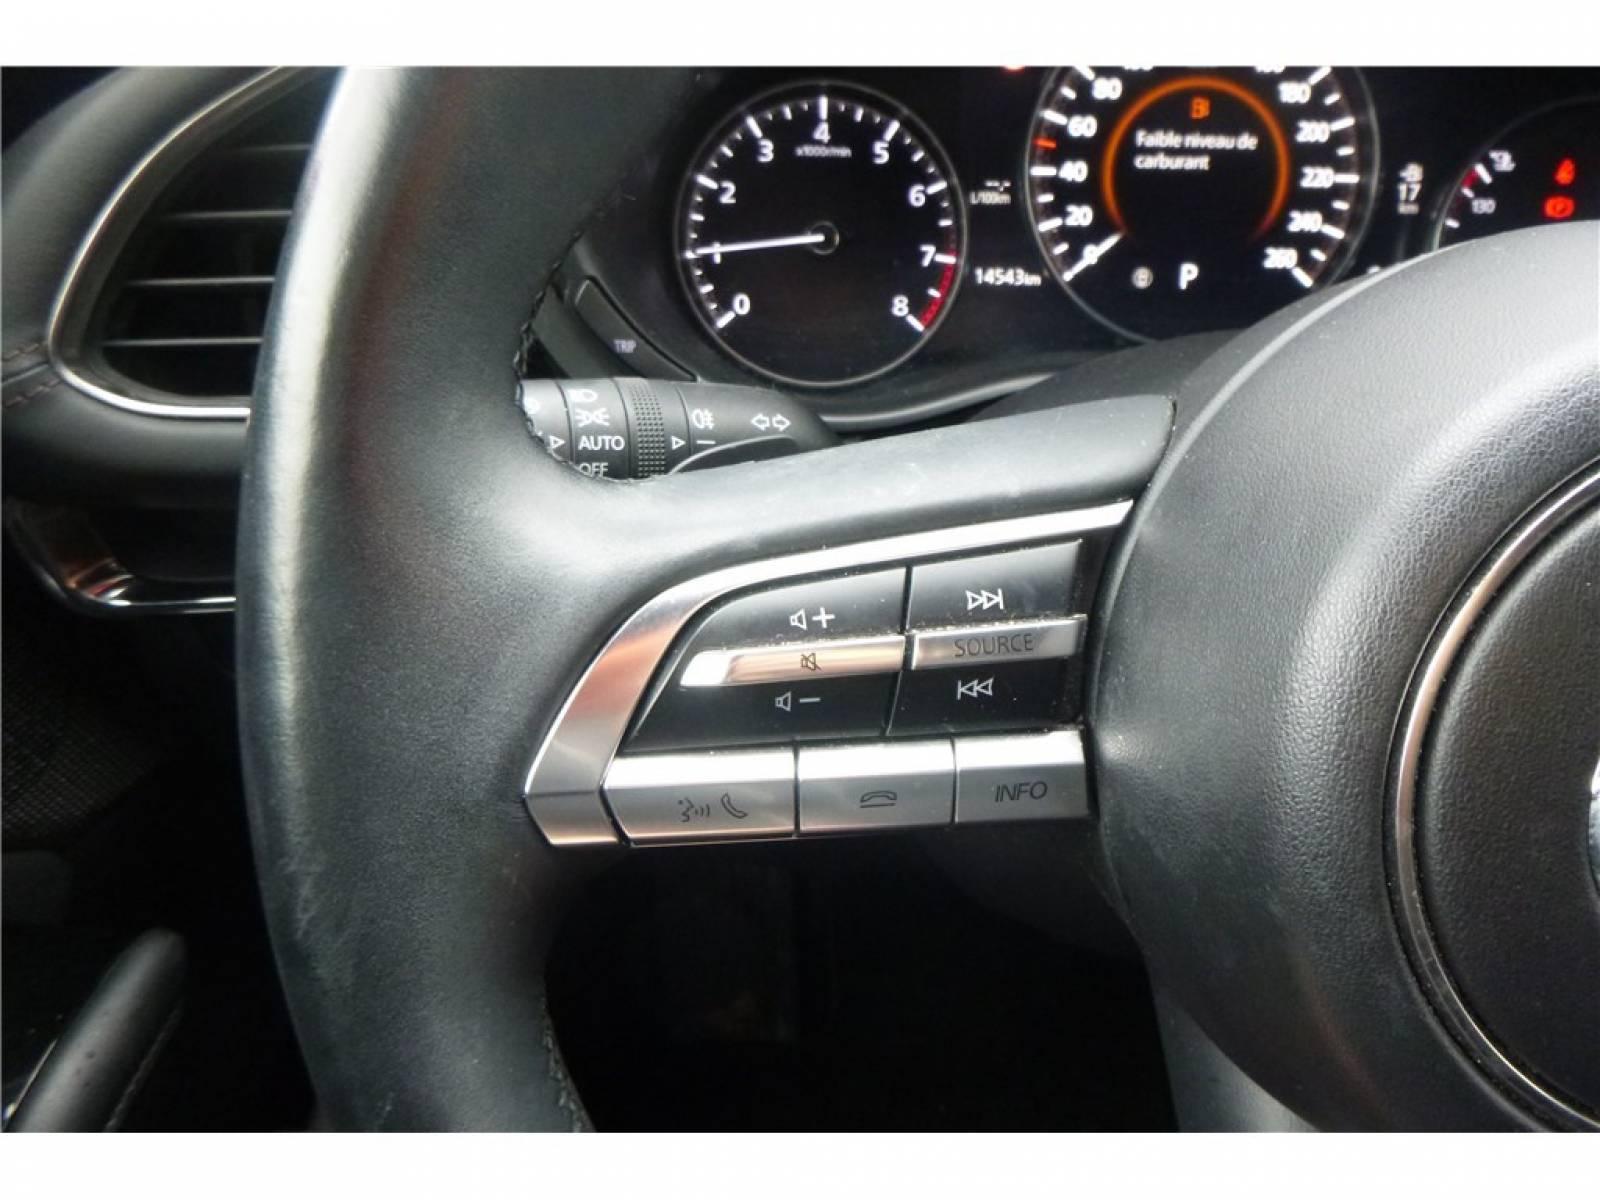 MAZDA Mazda3 5 portes 2.0L SKYACTIV-G M Hybrid 122 ch BVA6 - véhicule d'occasion - Groupe Guillet - Chalon Automobiles - 71100 - Chalon-sur-Saône - 21